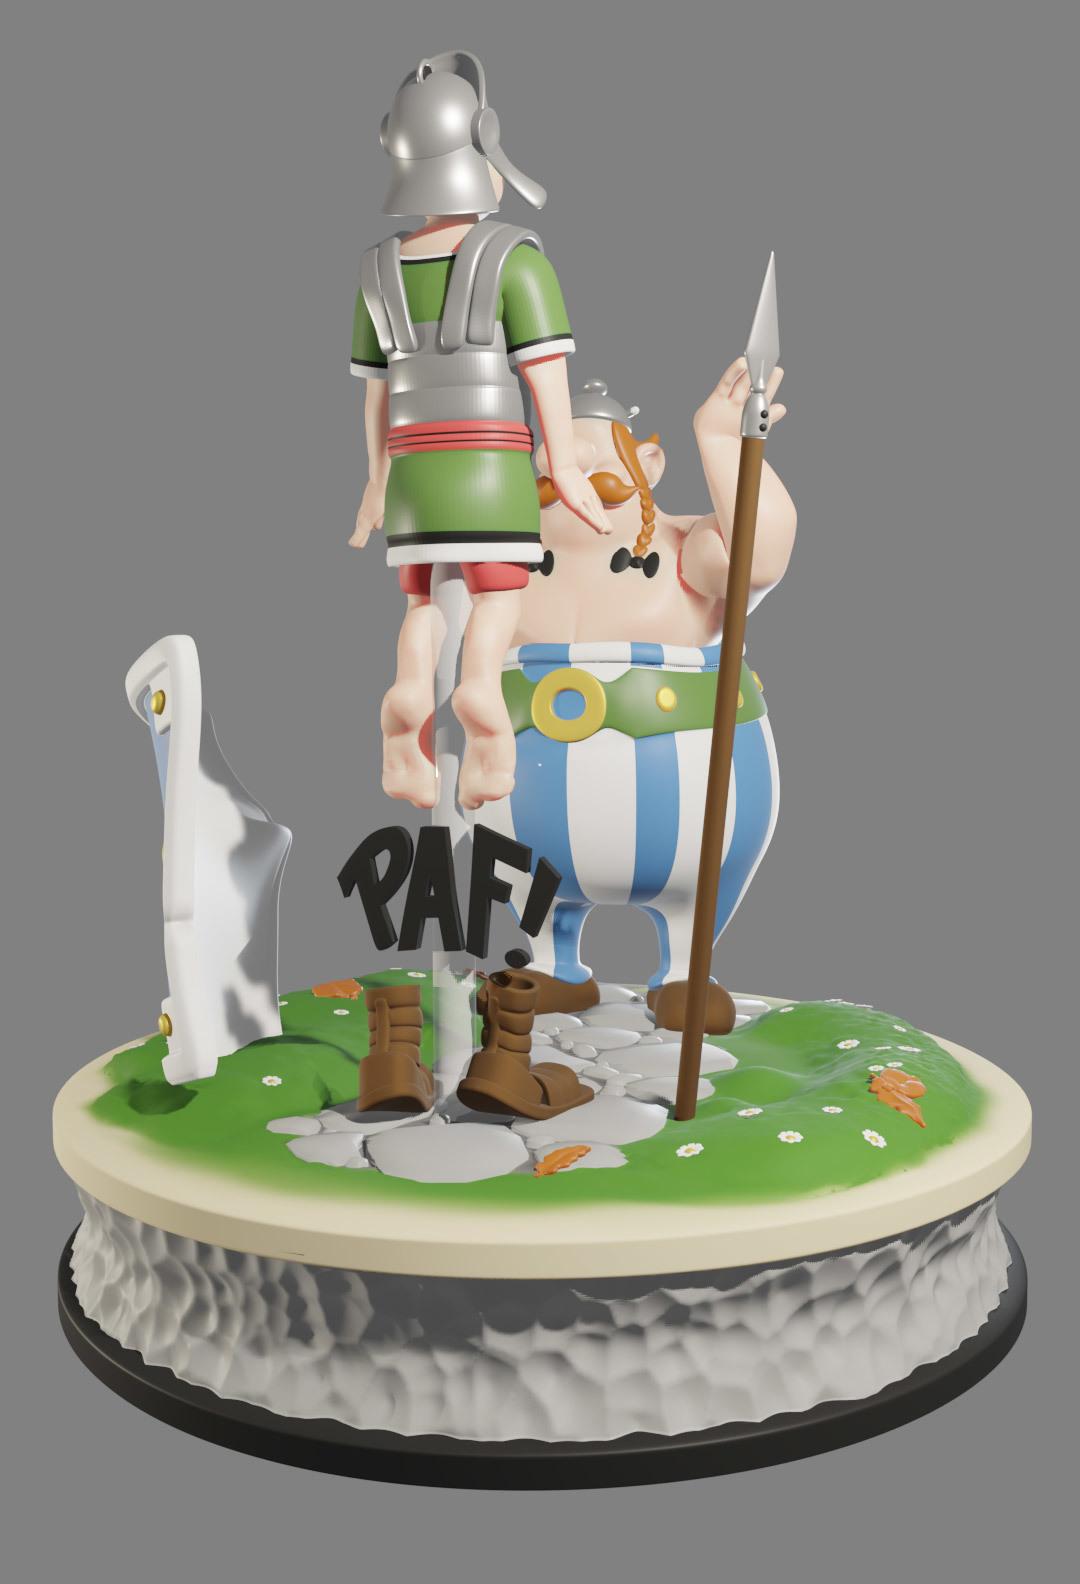 obe8.jpg Descargar archivo STL FANART - Obélix abofetea a un legionario romano - Diorama • Objeto para impresora 3D, foxgraph